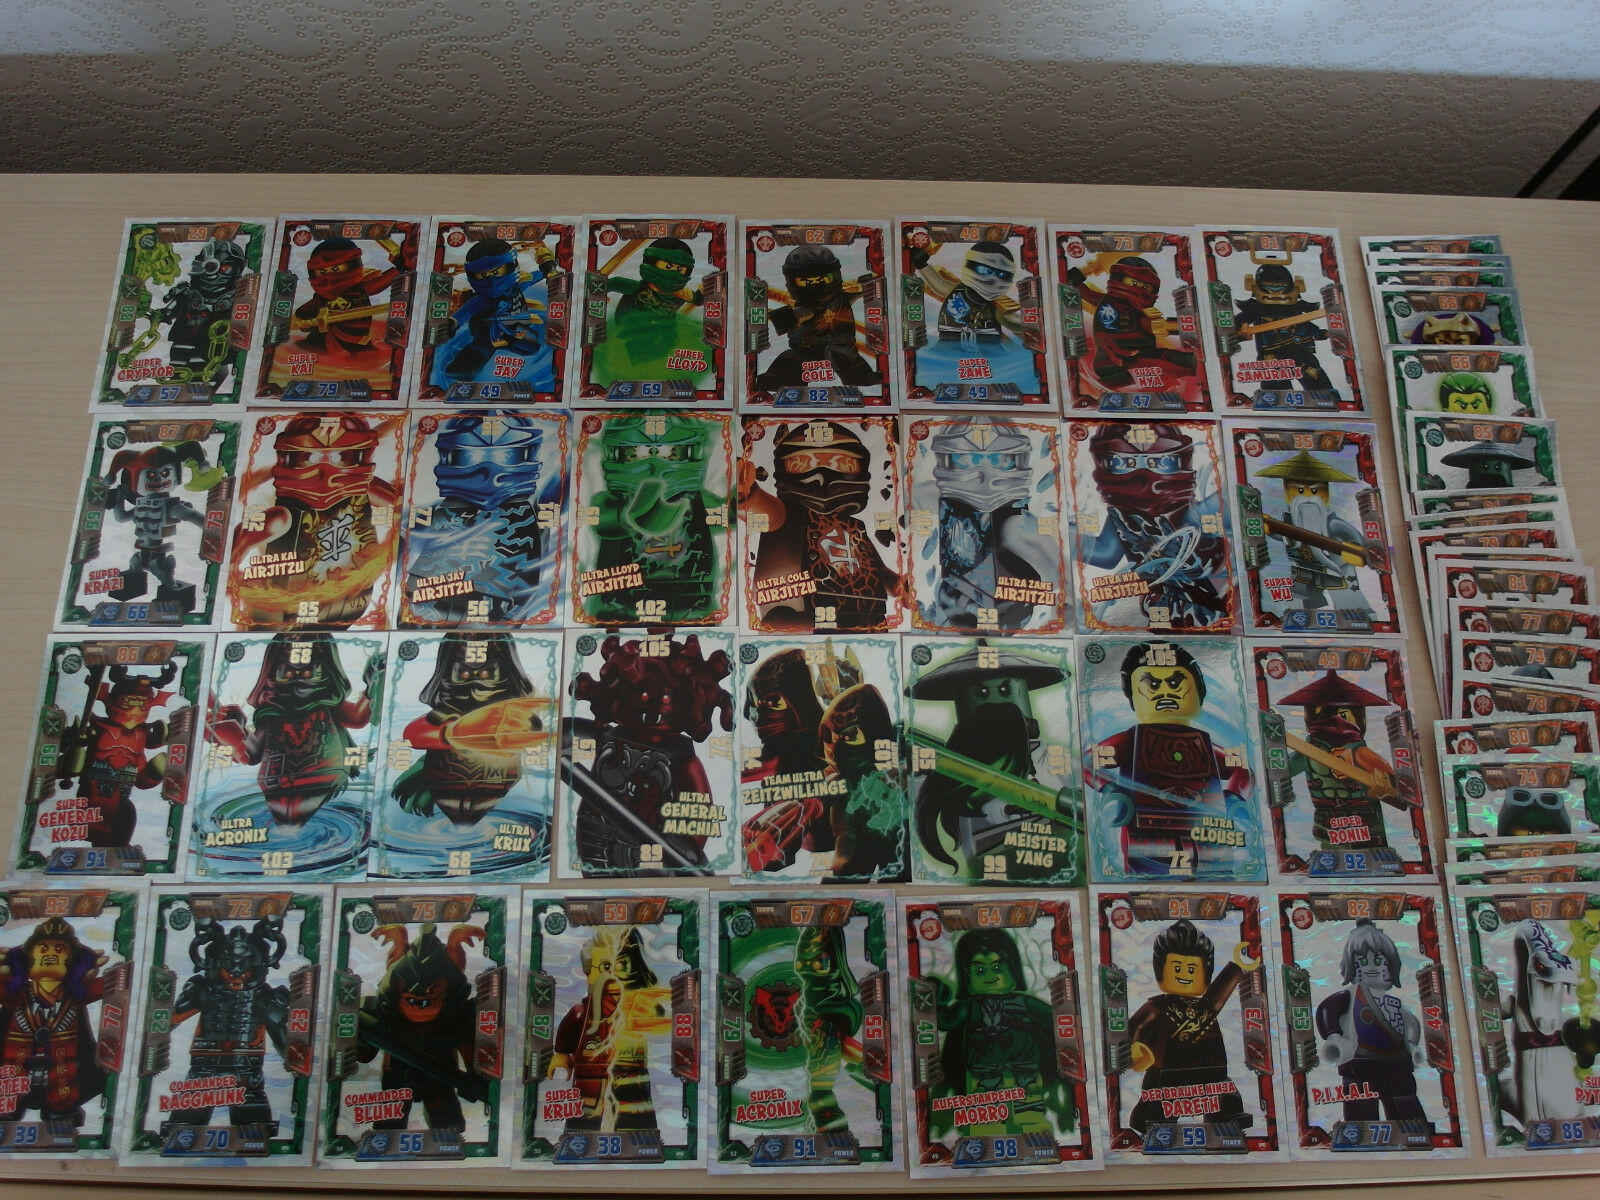 Lego Ninjago Serie 2 Ultra, Mega, Spezial, limitierte, Glitzer Karten aussuchen